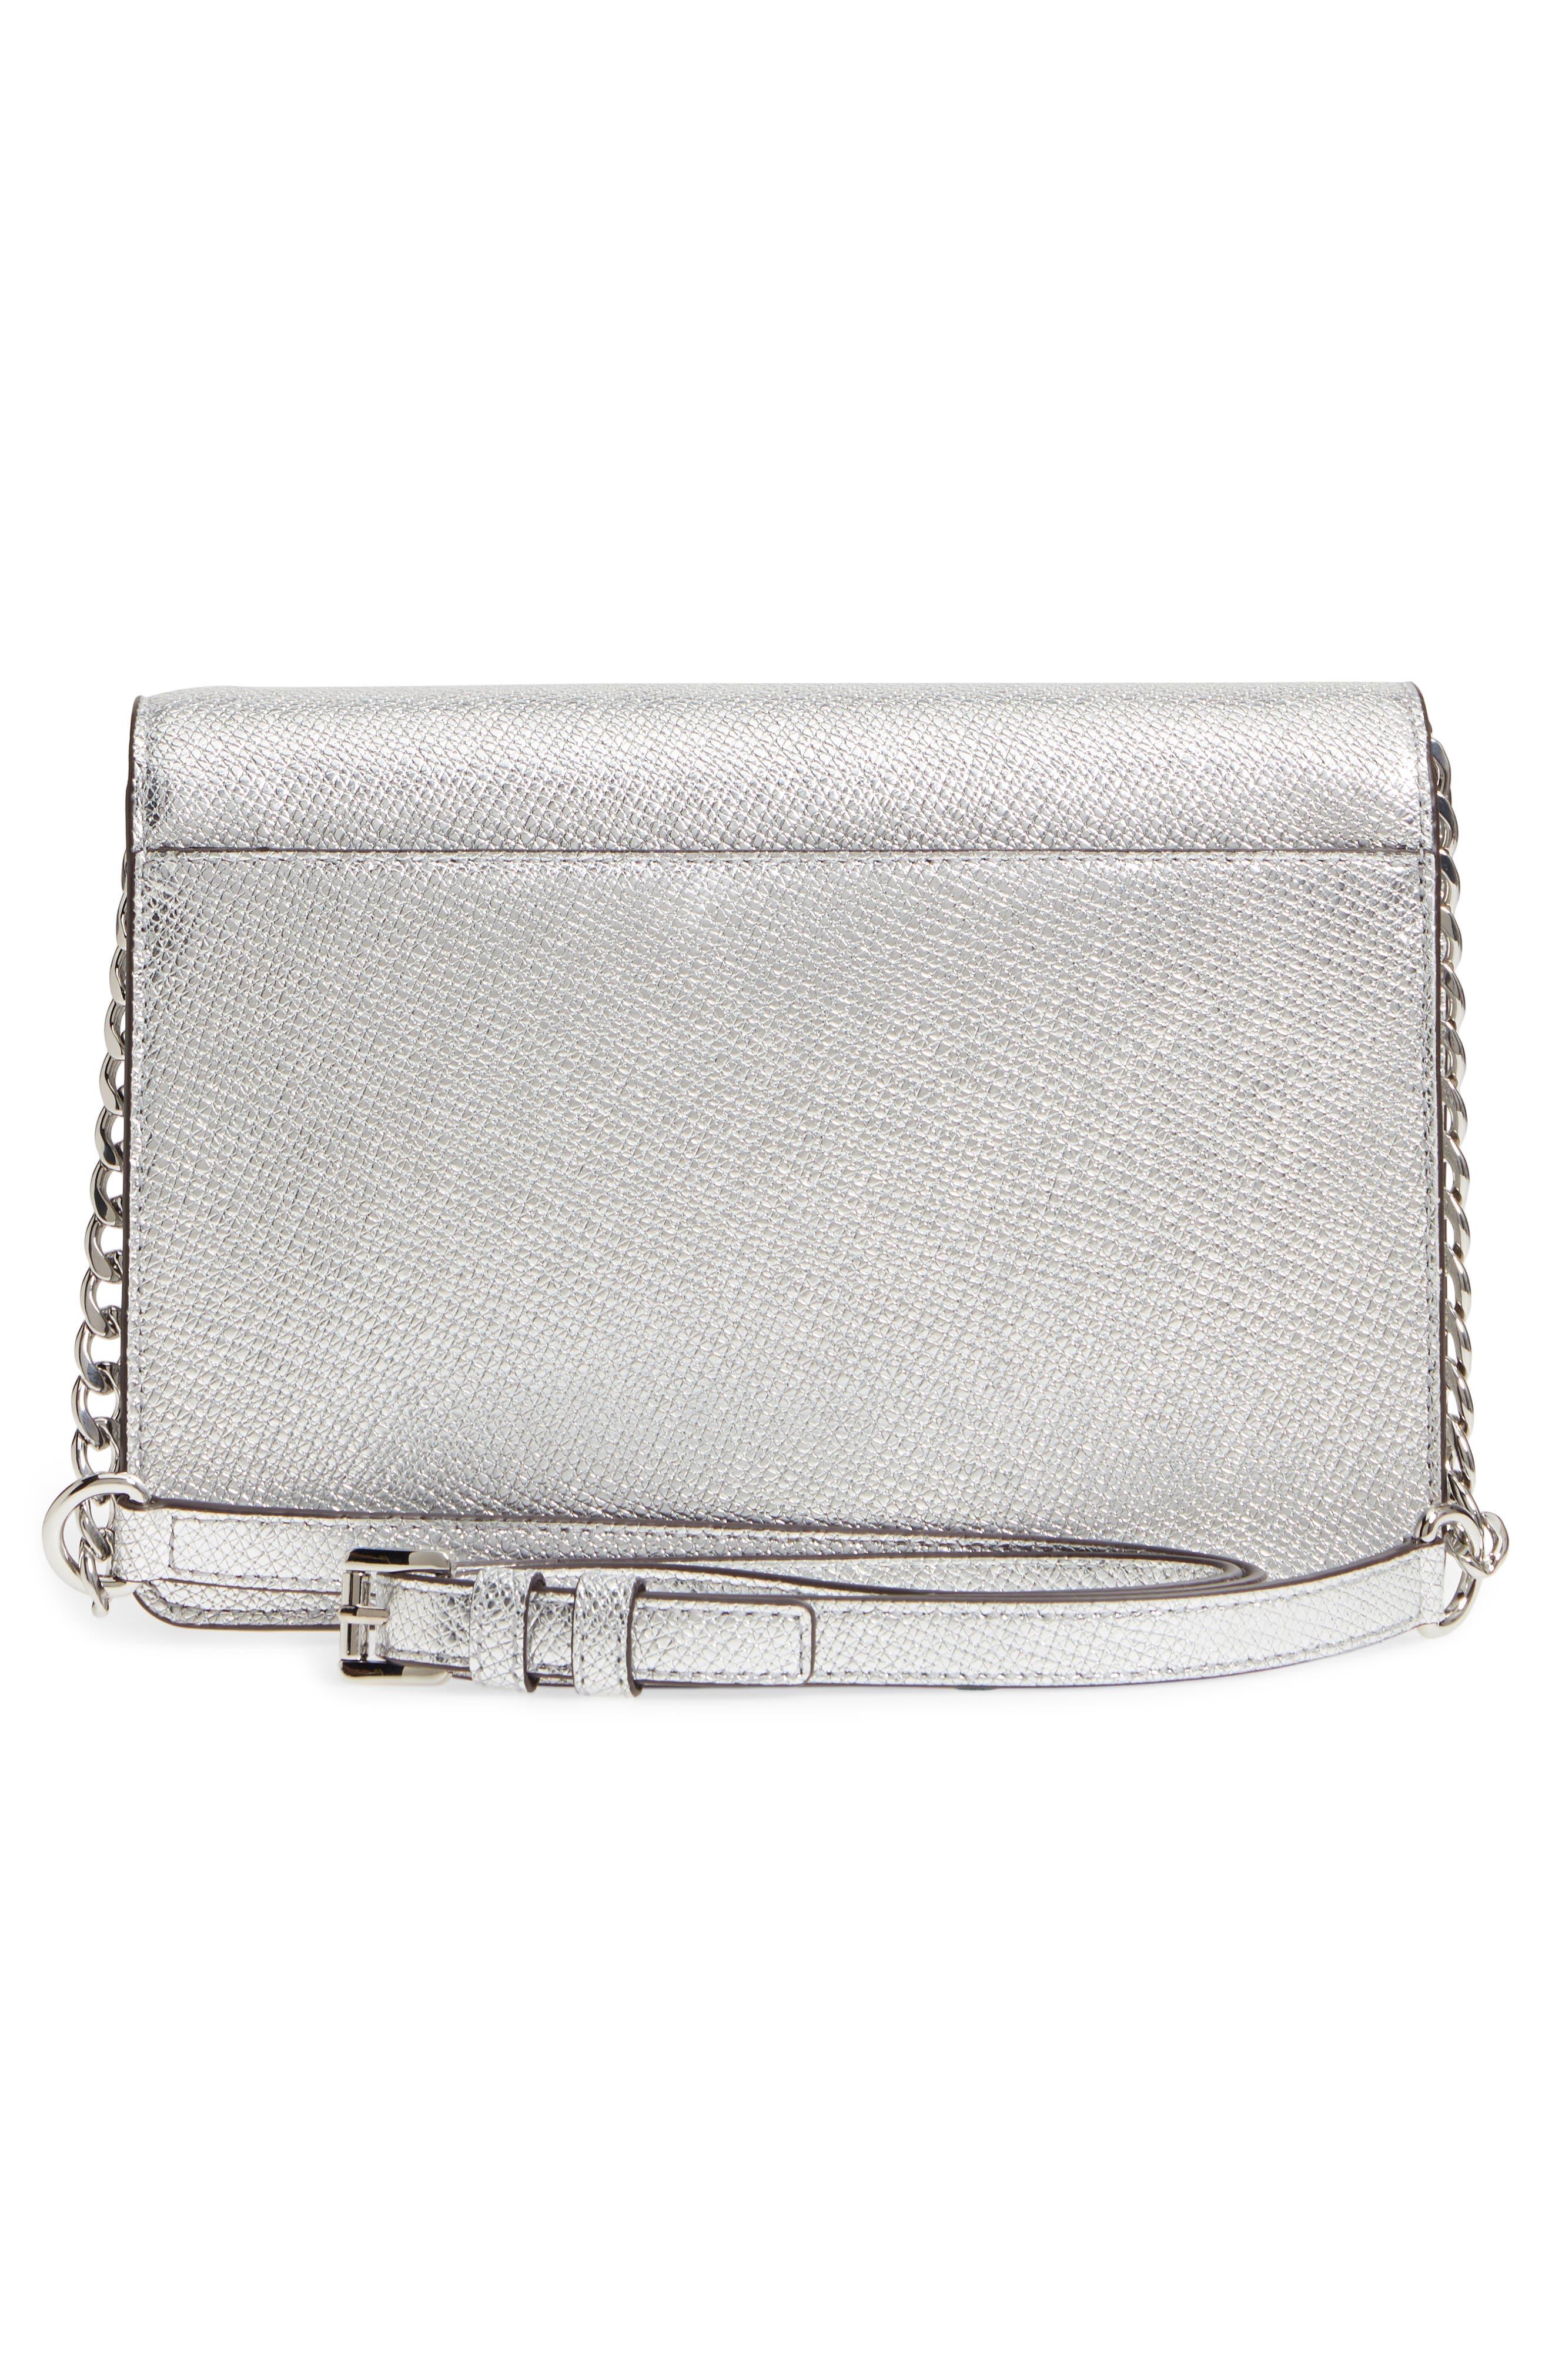 MICHAEL Michael Kors Large Metallic Leather Crossbody Bag,                             Alternate thumbnail 3, color,                             040